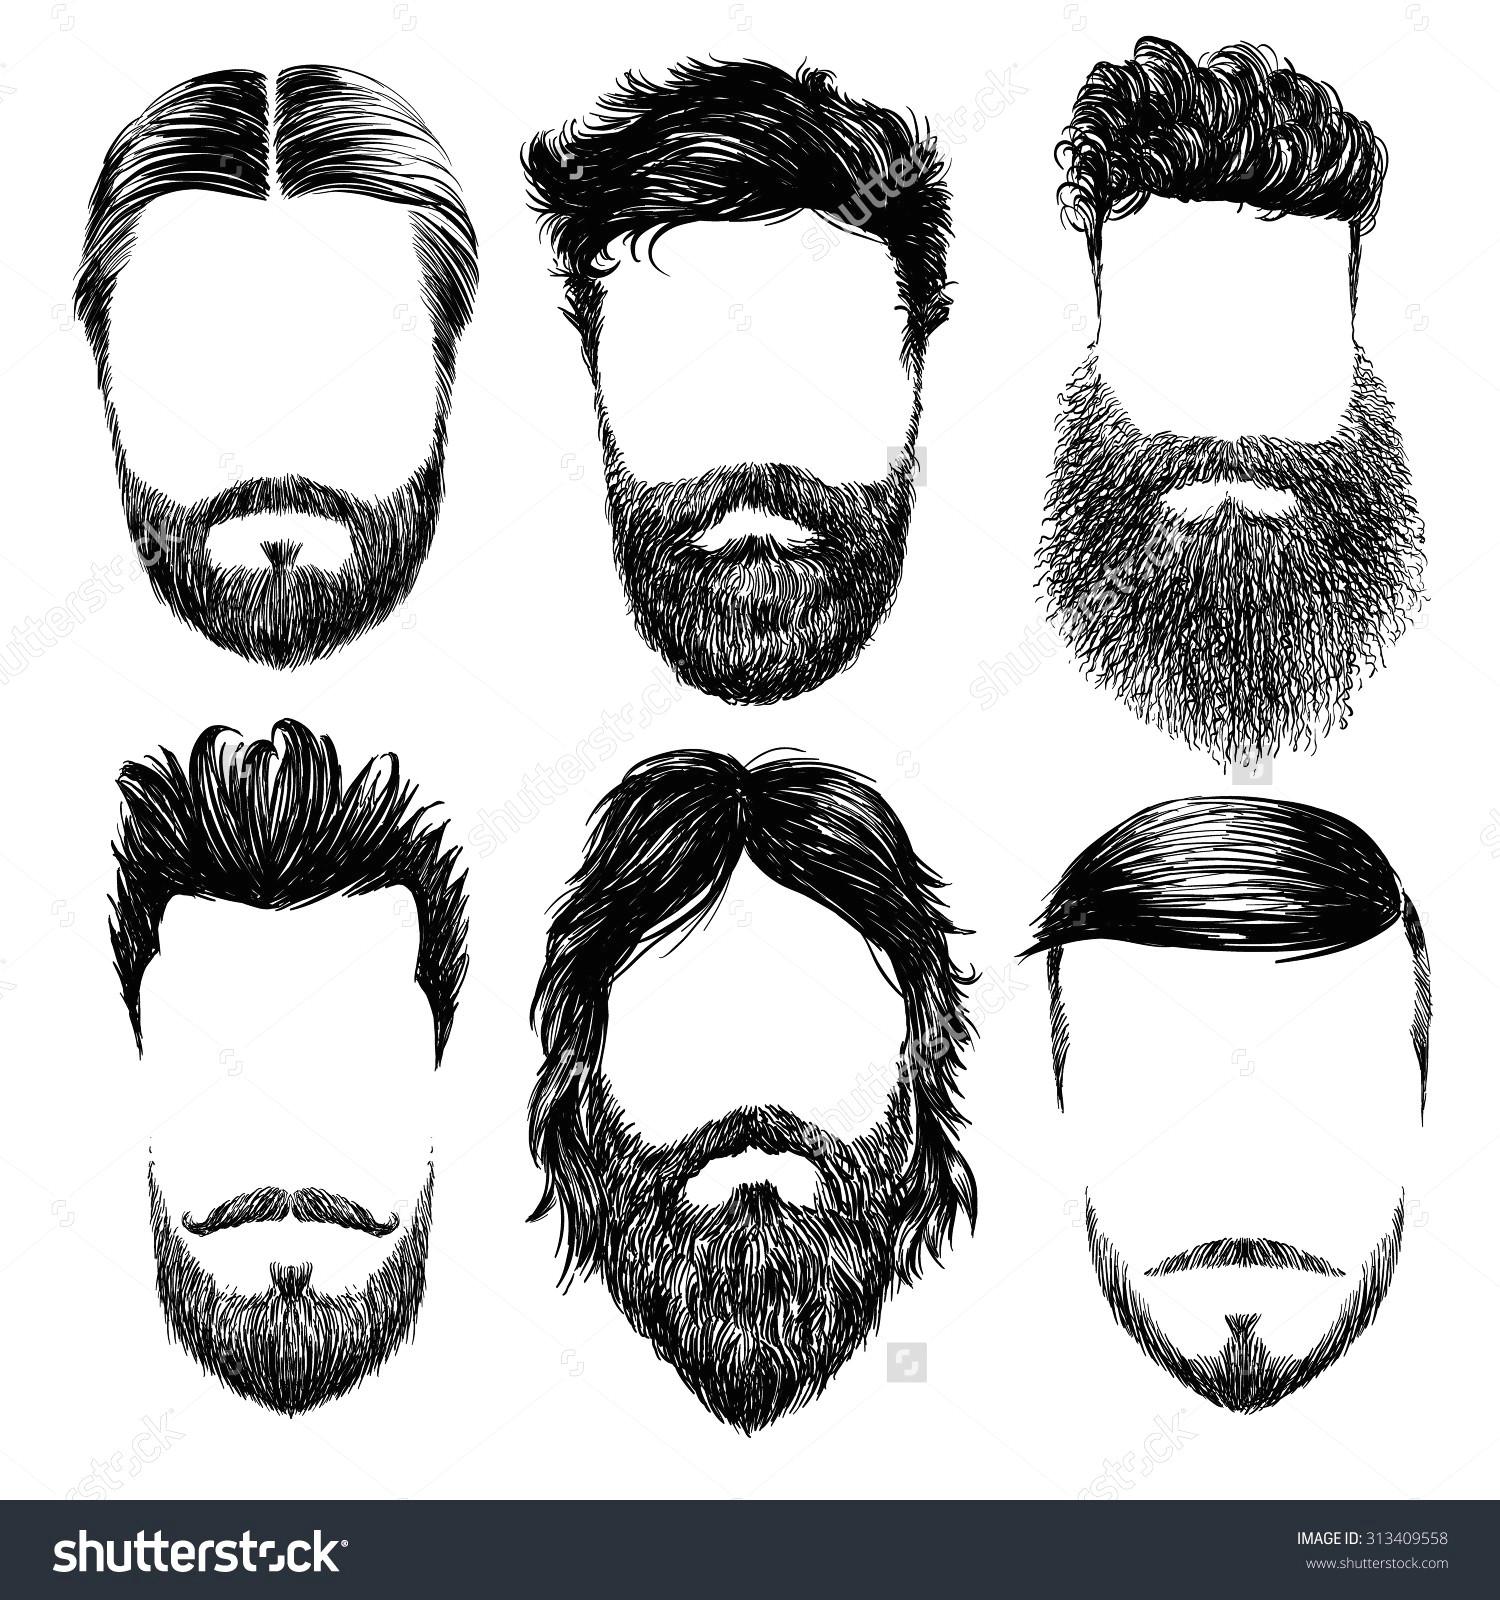 beautiful tumblr drawing hipster hair drawings